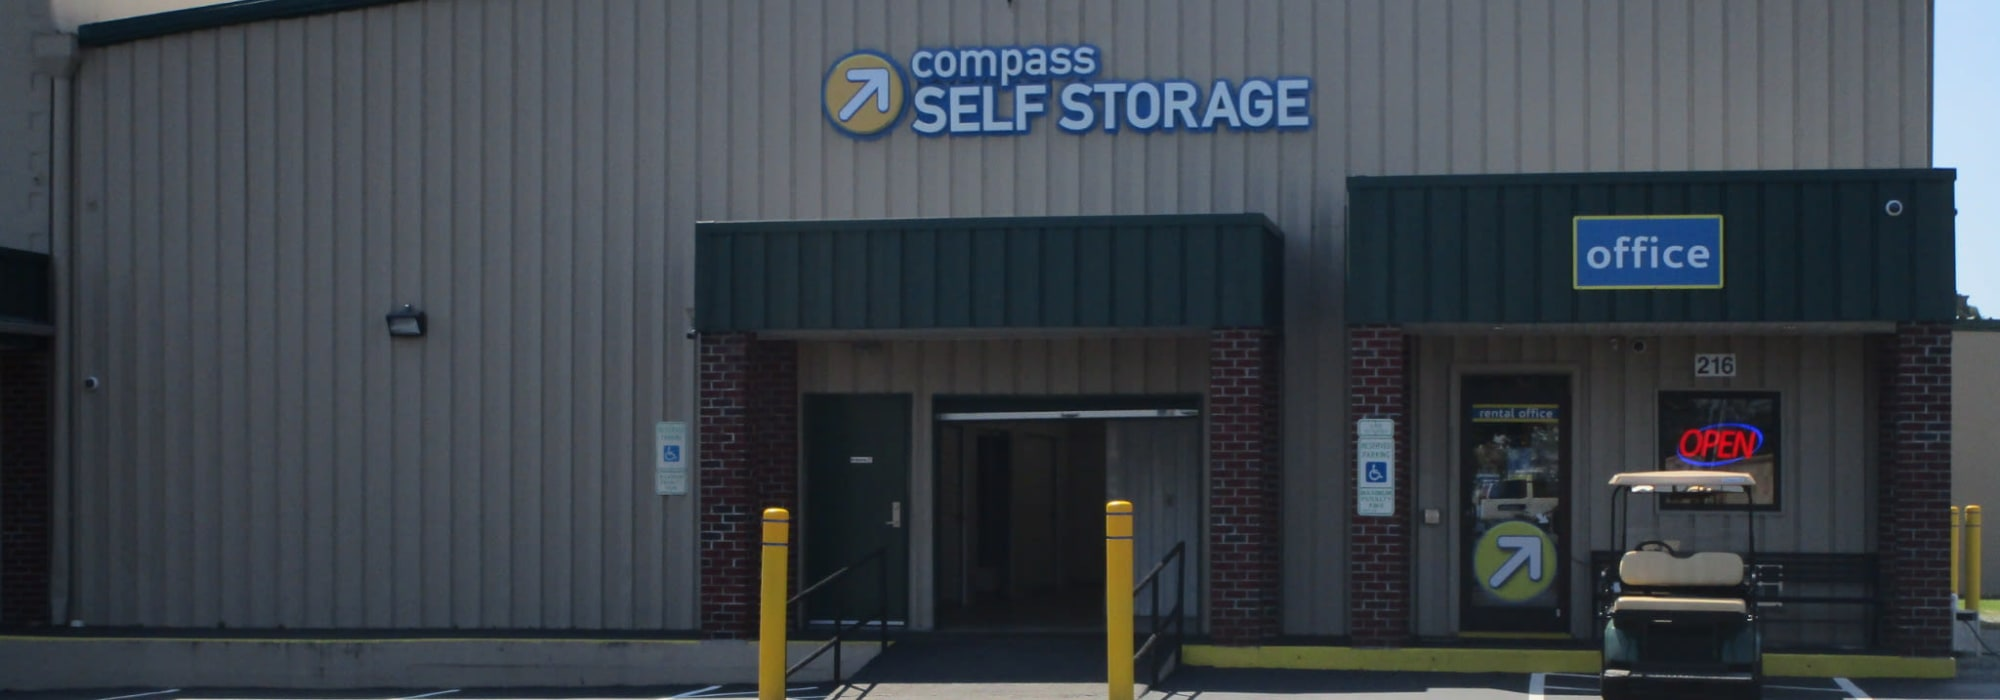 Self storage in Goldsboro NC